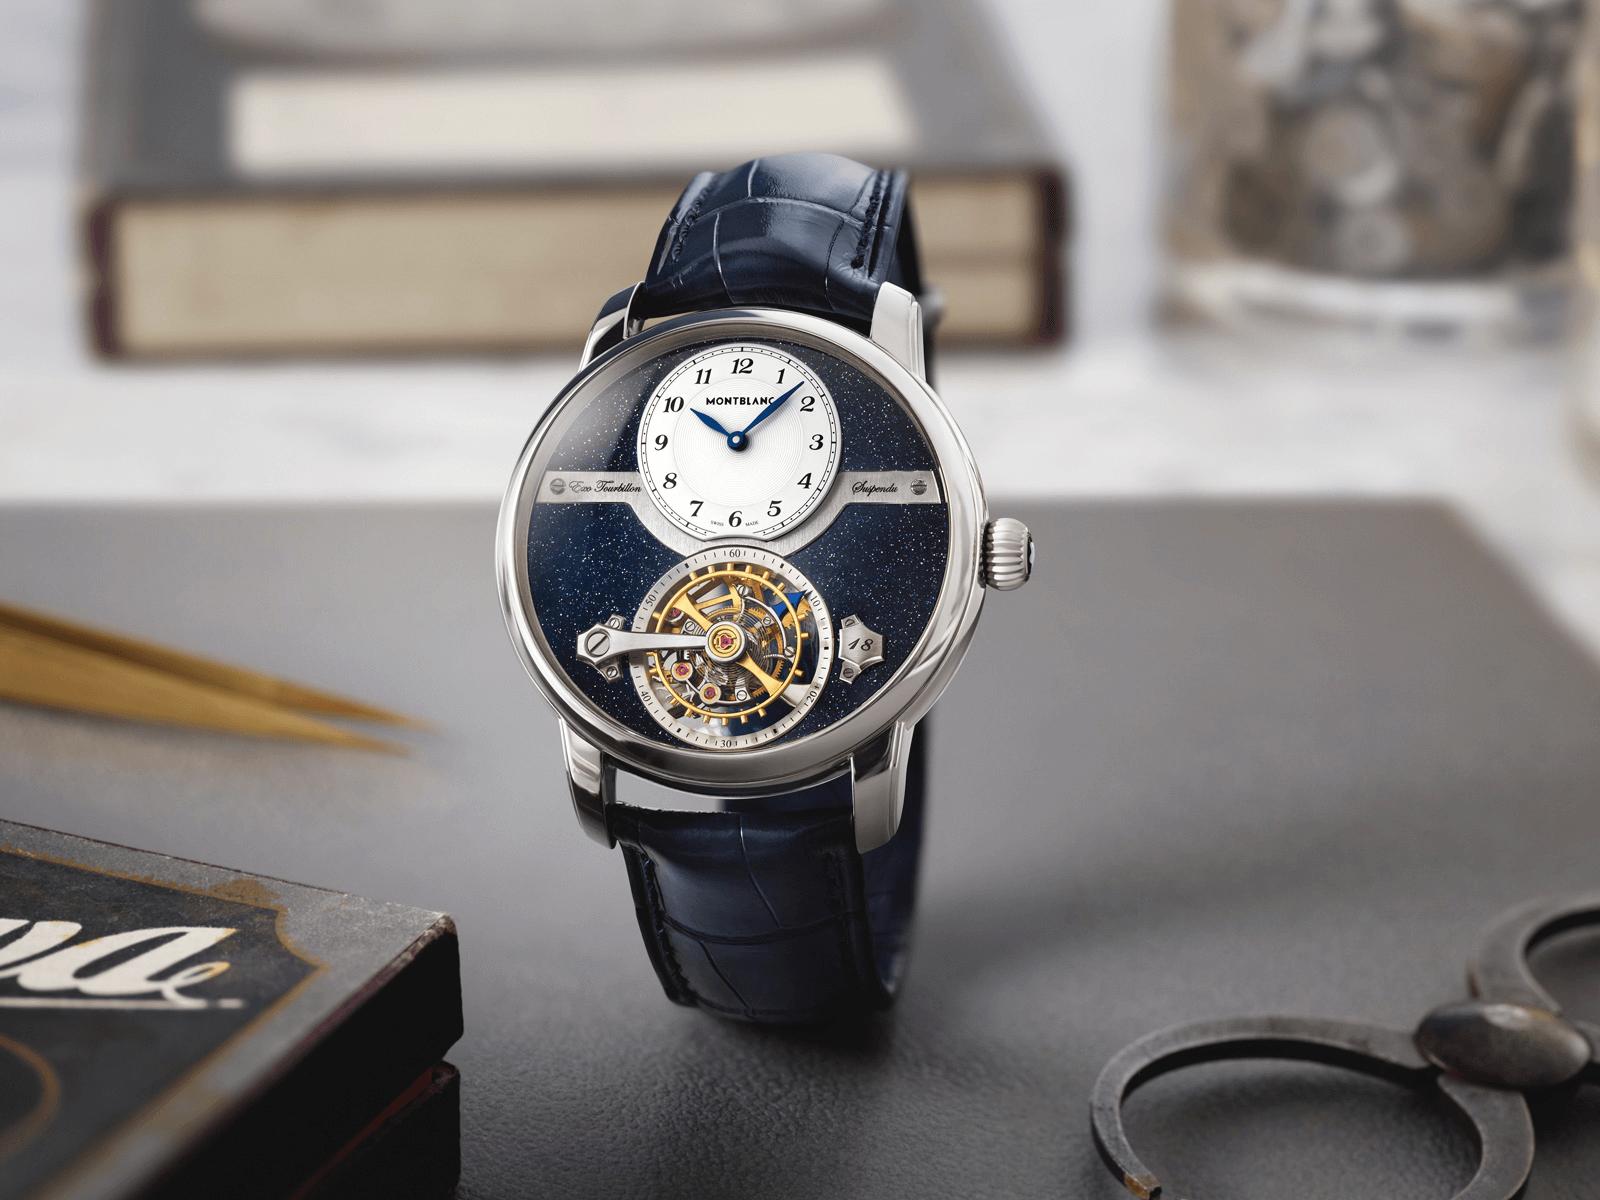 đồng hồ montblanc tourbillon suspended exo mới watches & wonders 2021